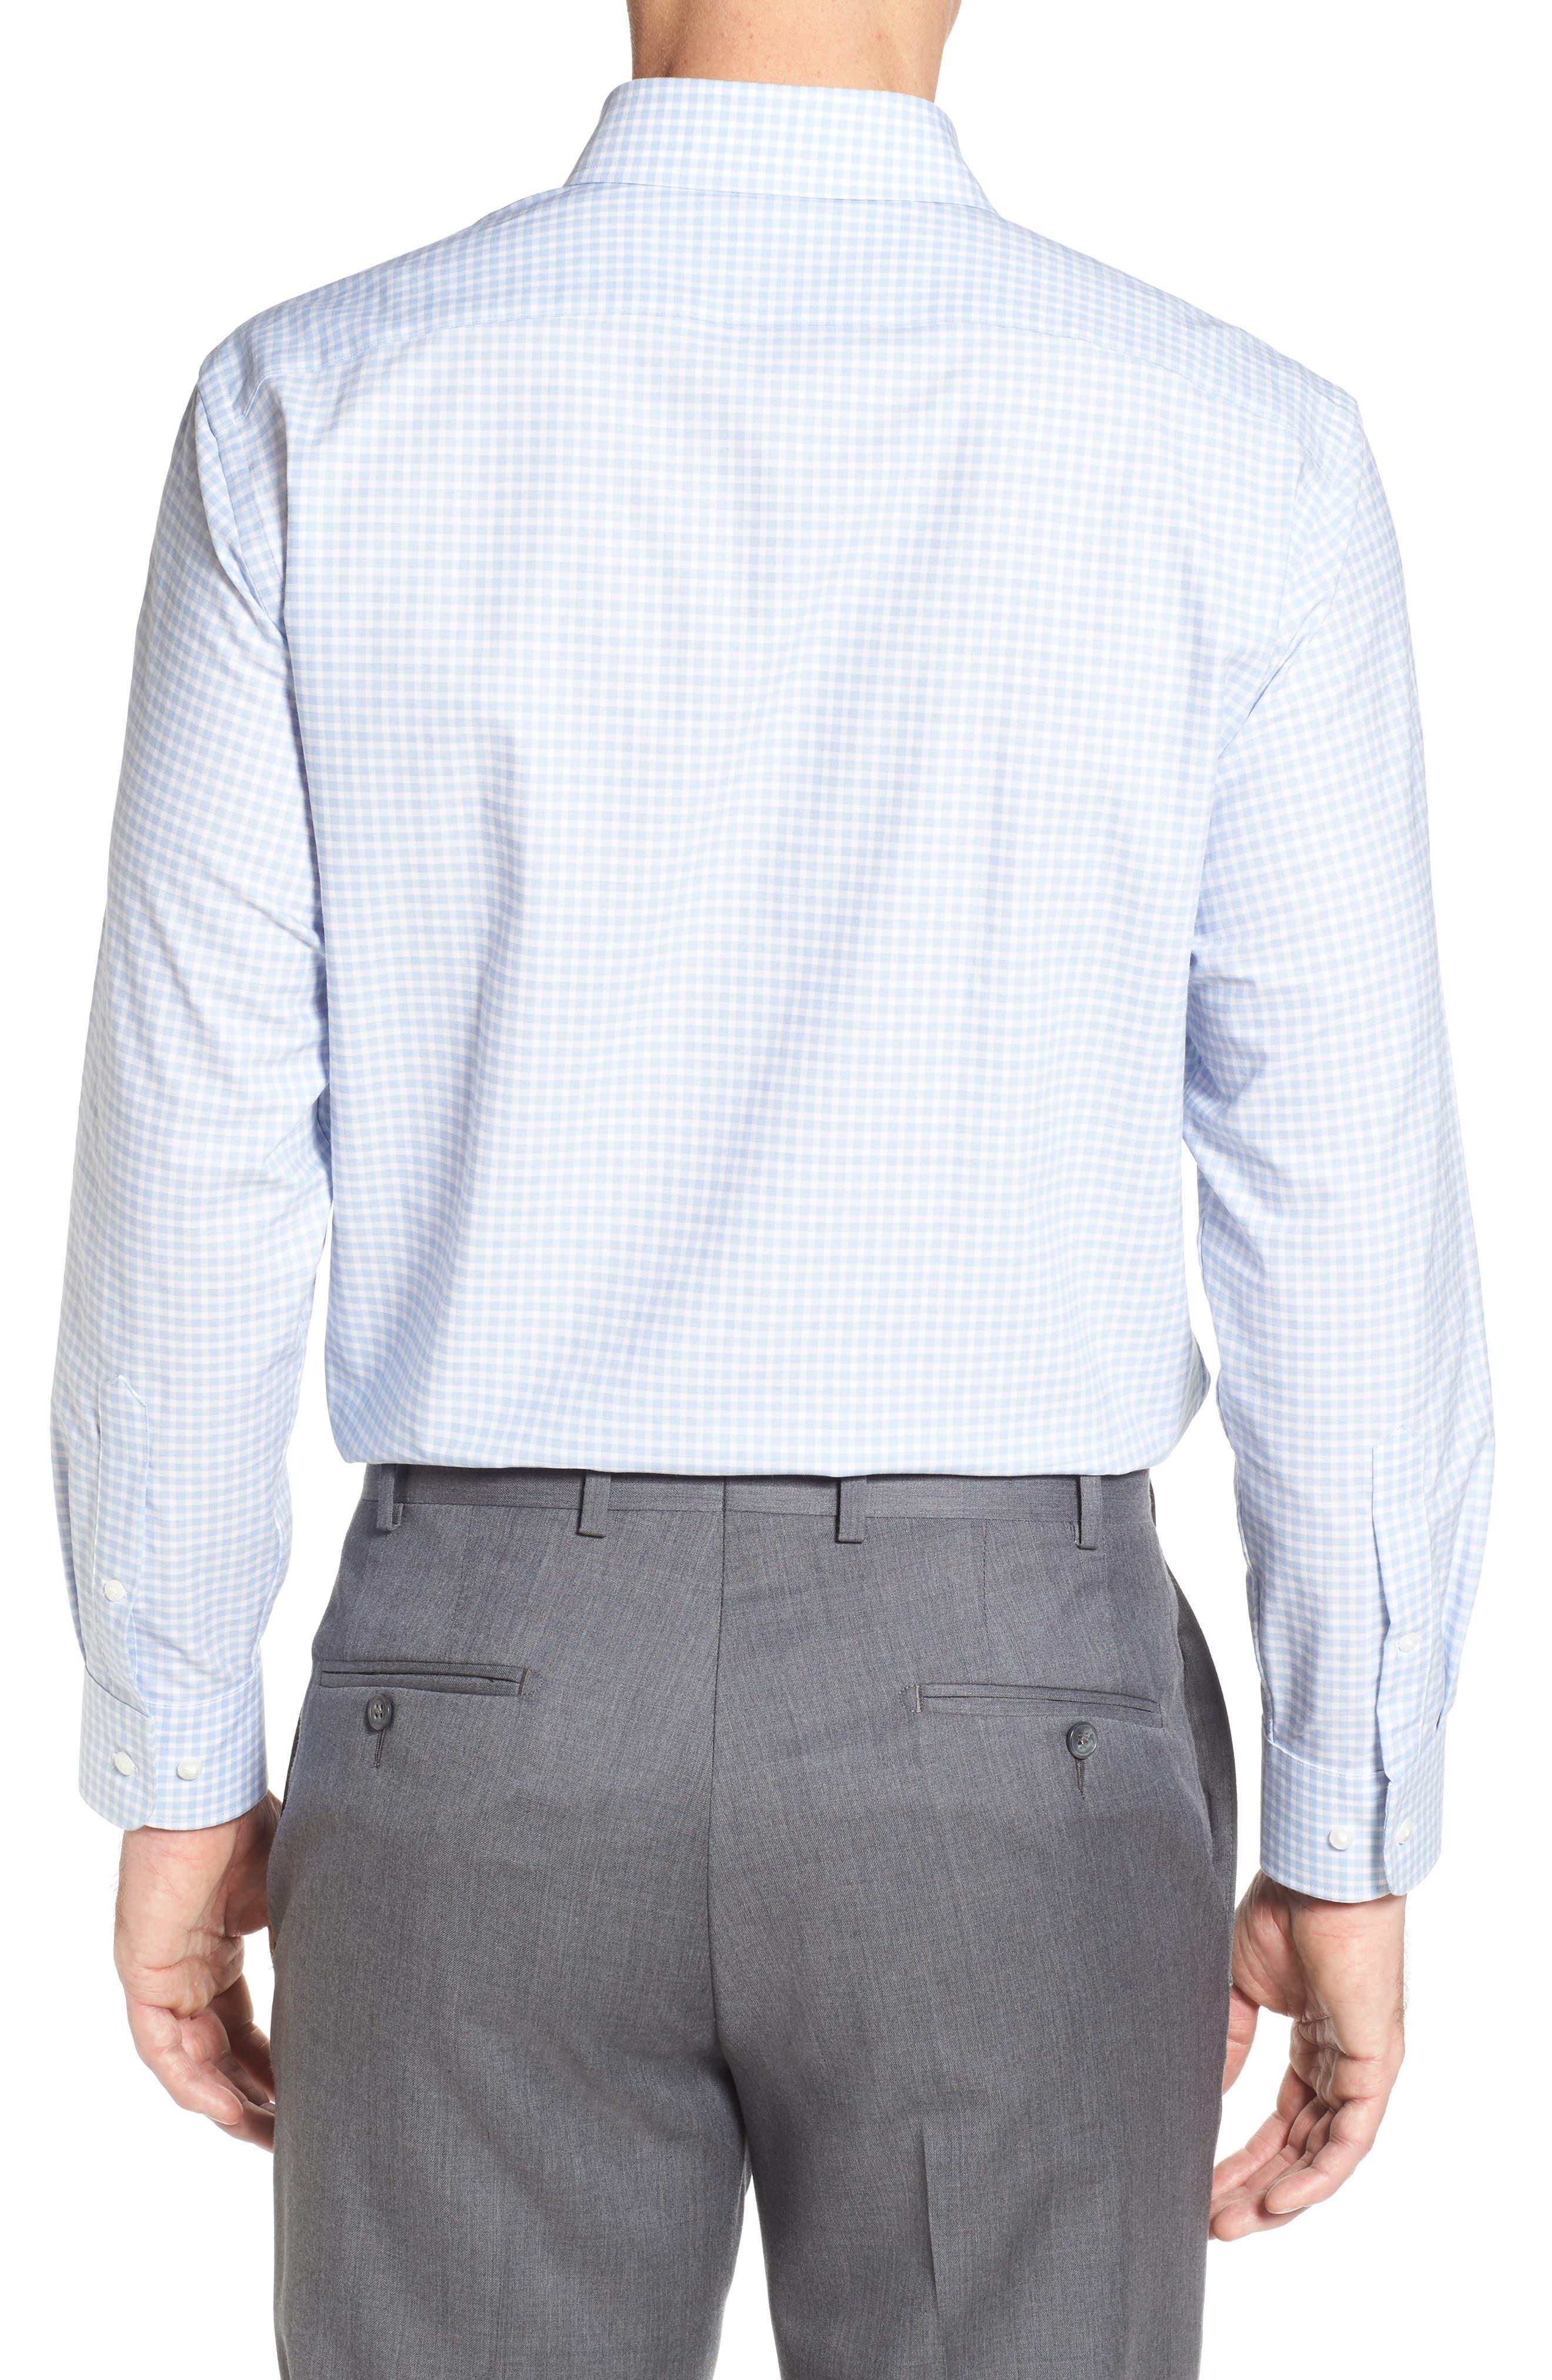 Alternate Image 2  - Nordstrom Men's Shop Tech-Smart Traditional Fit Stretch Check Dress Shirt